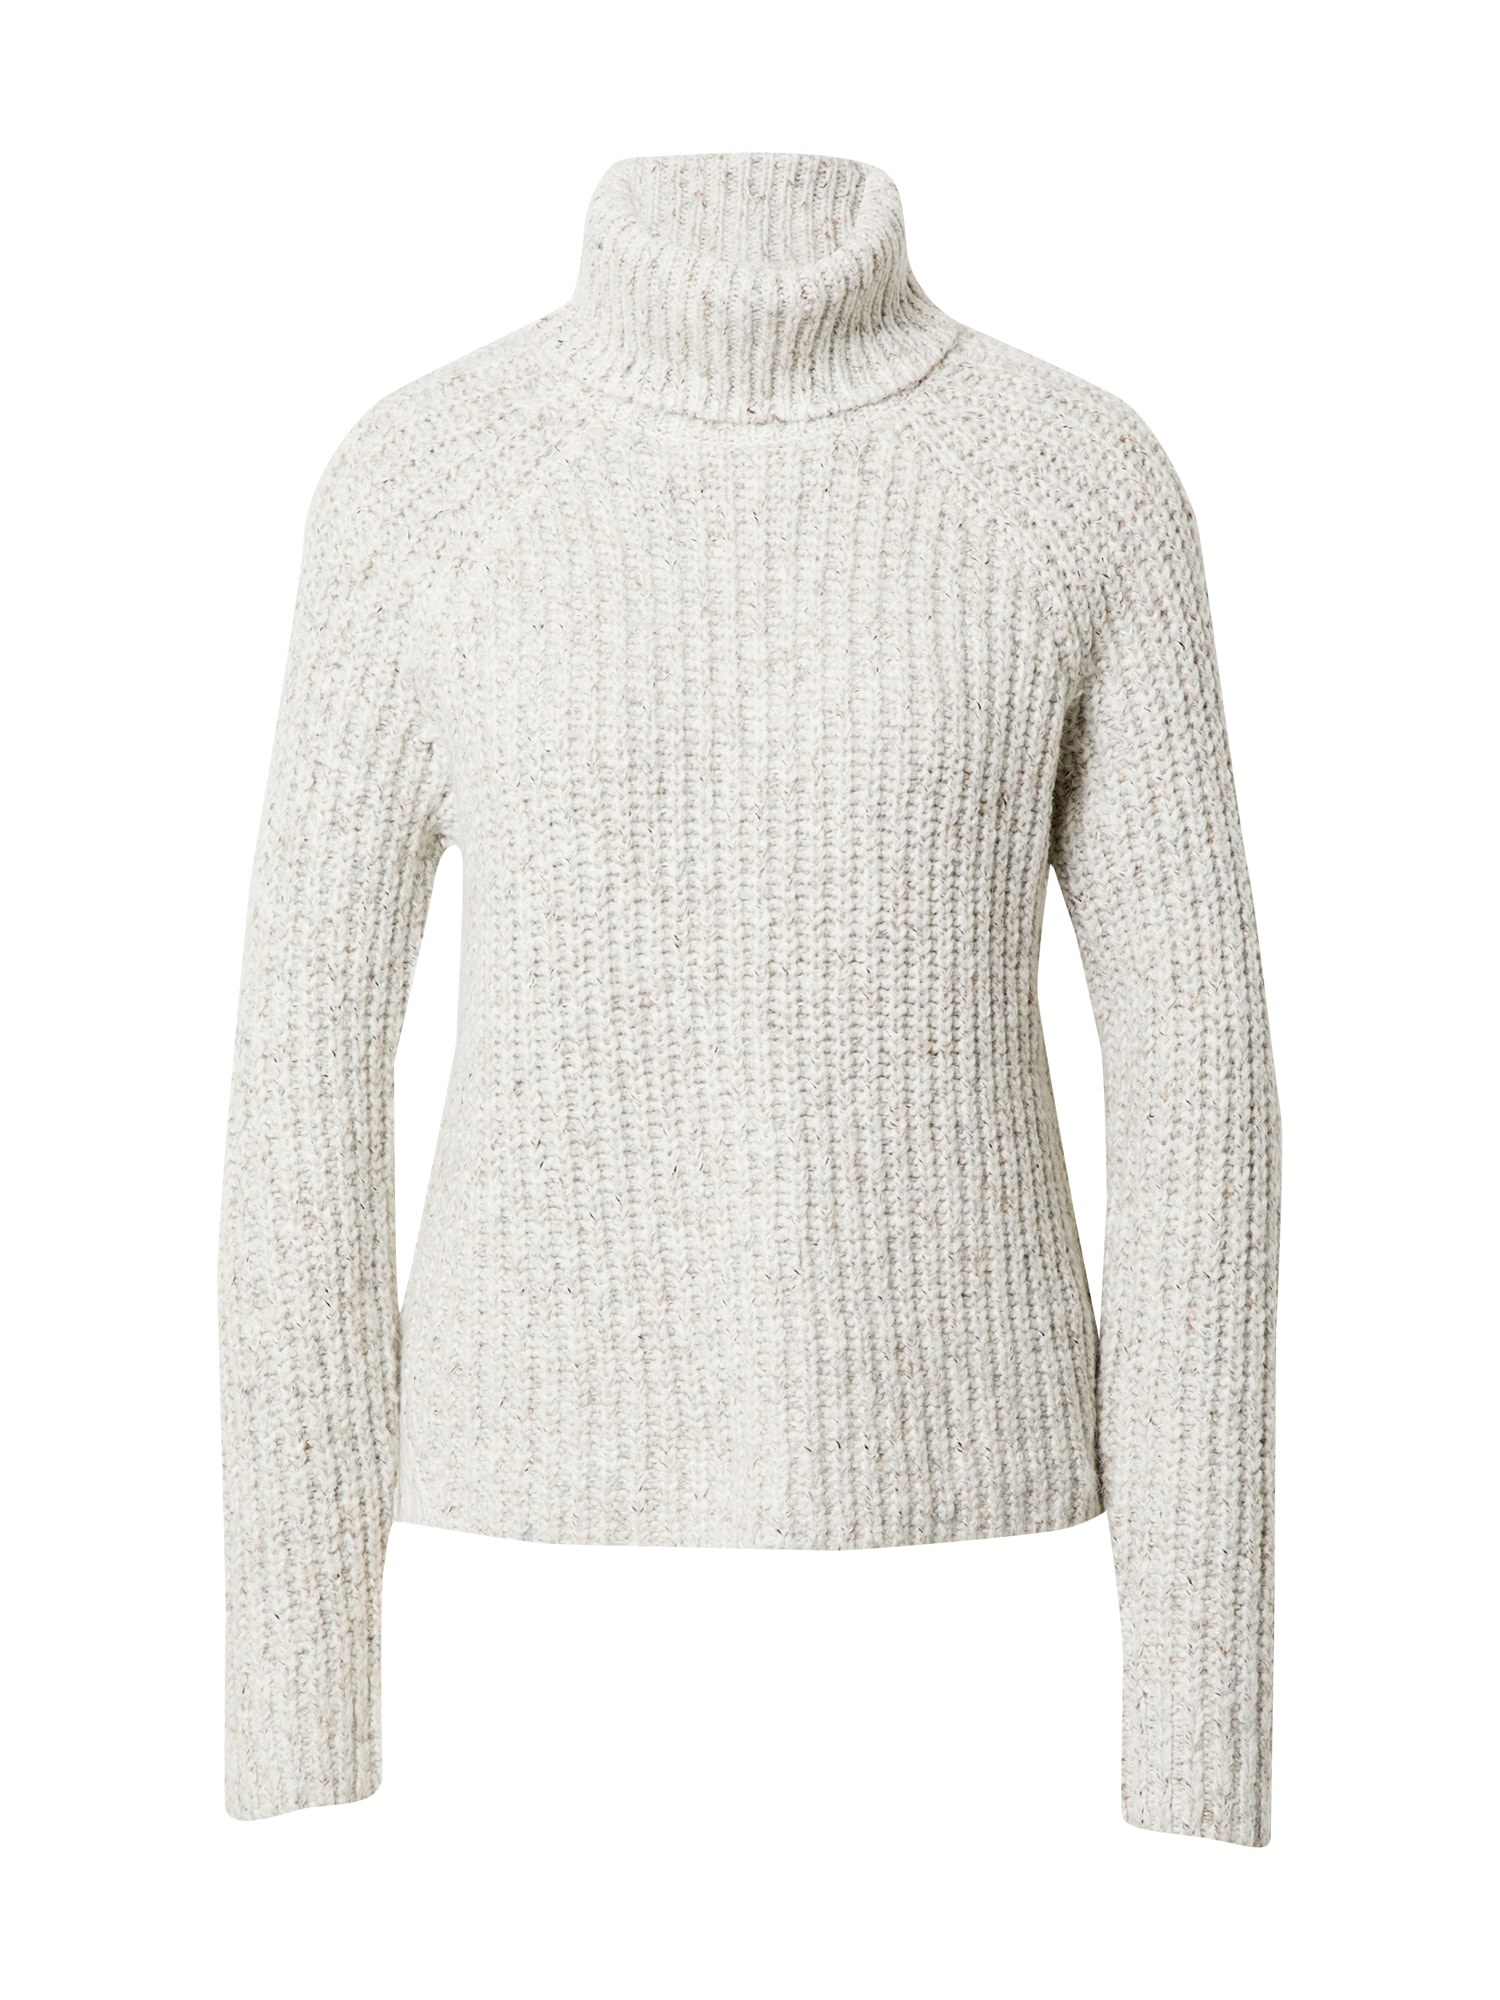 Abercrombie & Fitch Megztinis marga smėlio spalva